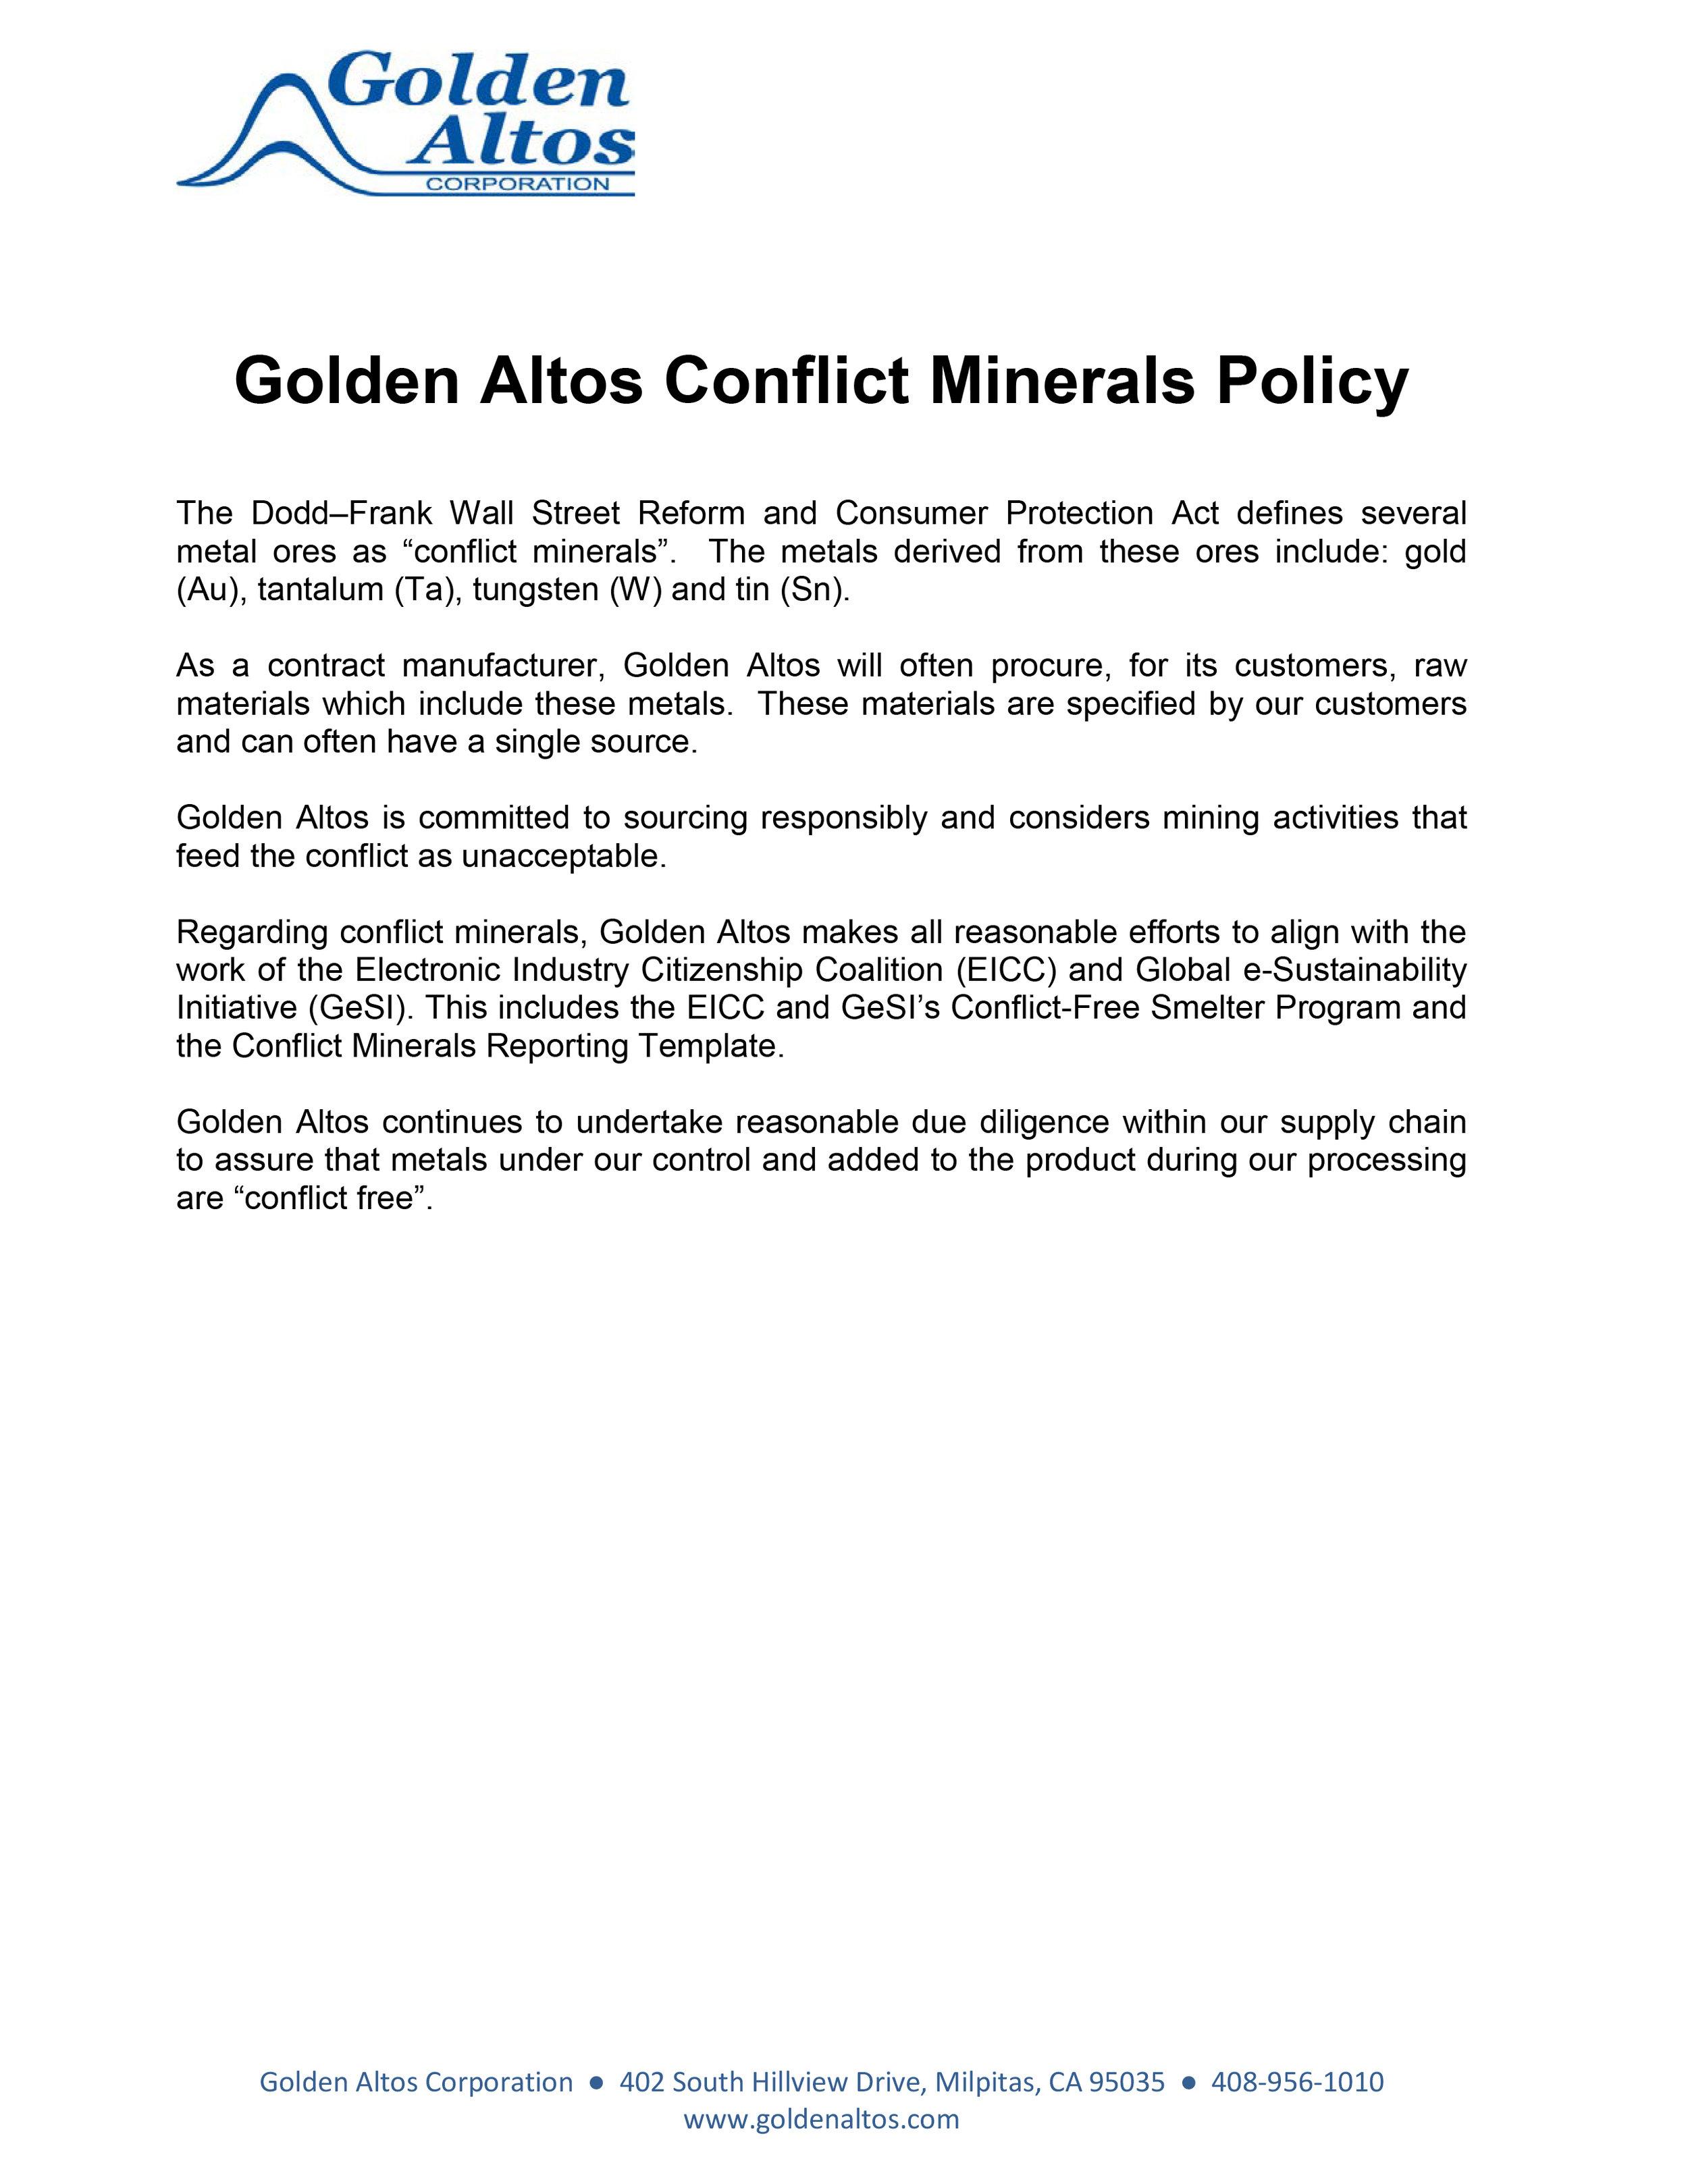 Golden Altos Conflict Minerals Policy.jpg